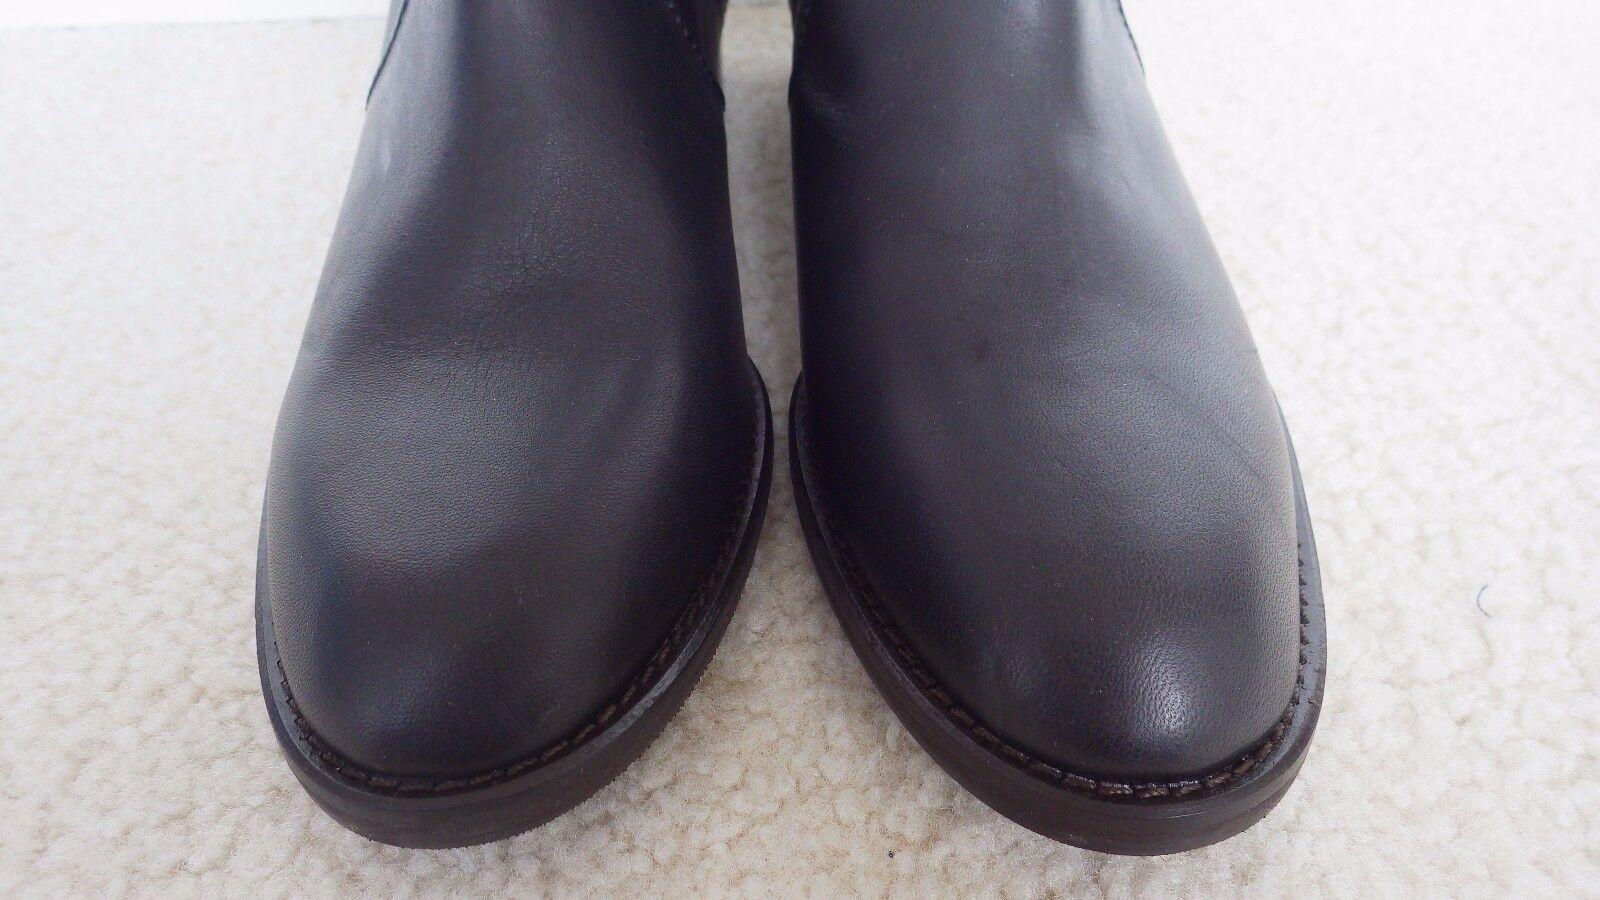 New damen J.Crew Dix Tab Ankle Ankle Ankle Stiefel, Chocolate, Größe 8.5 352103